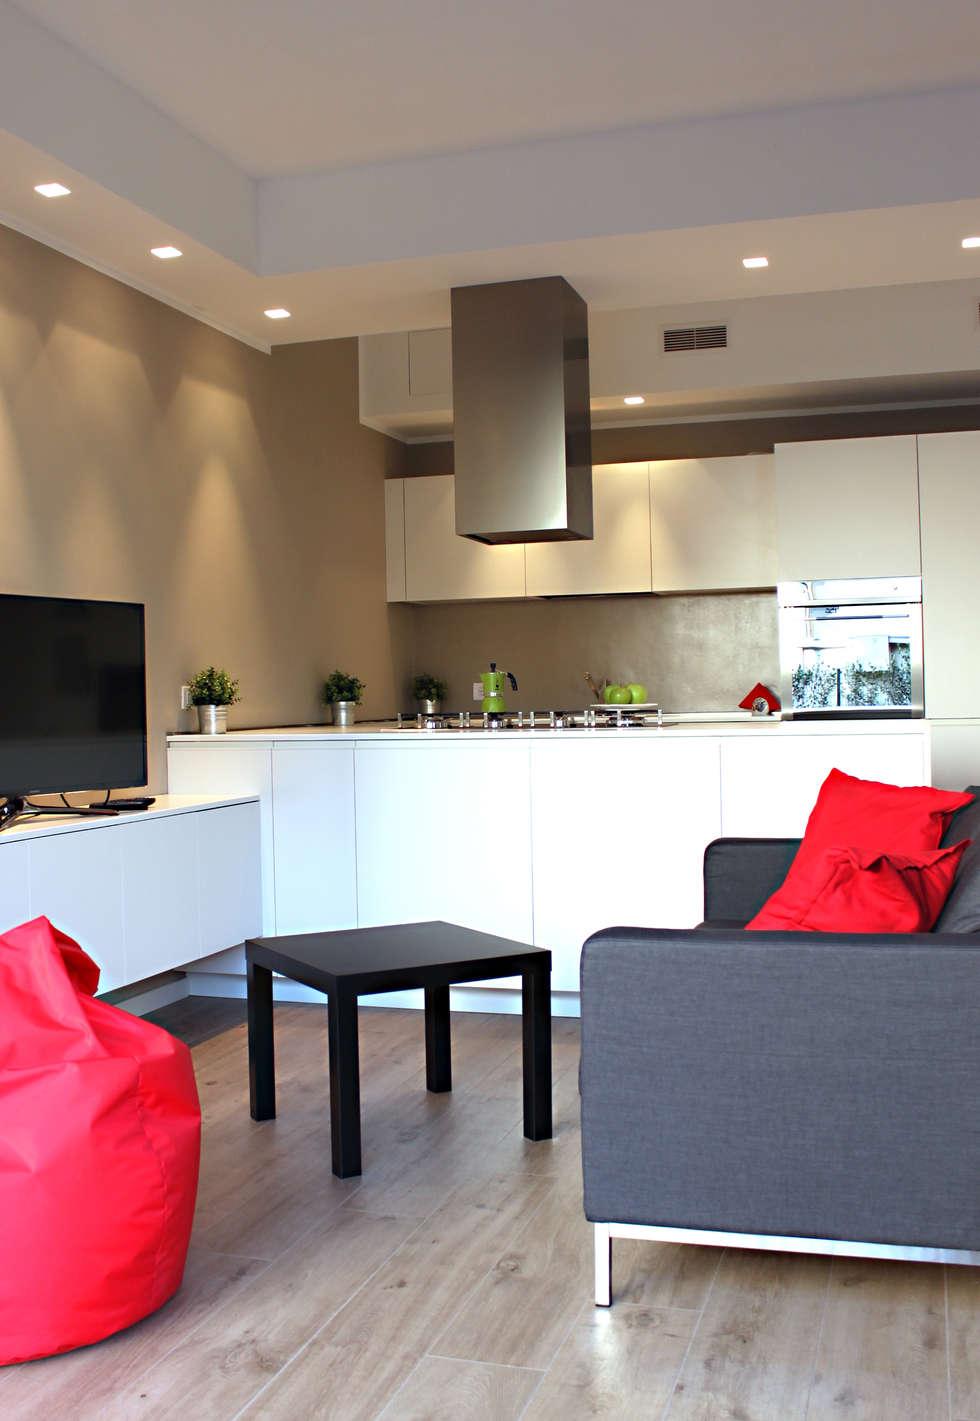 Idee arredamento casa interior design homify - Soggiorno con cucina a vista ...